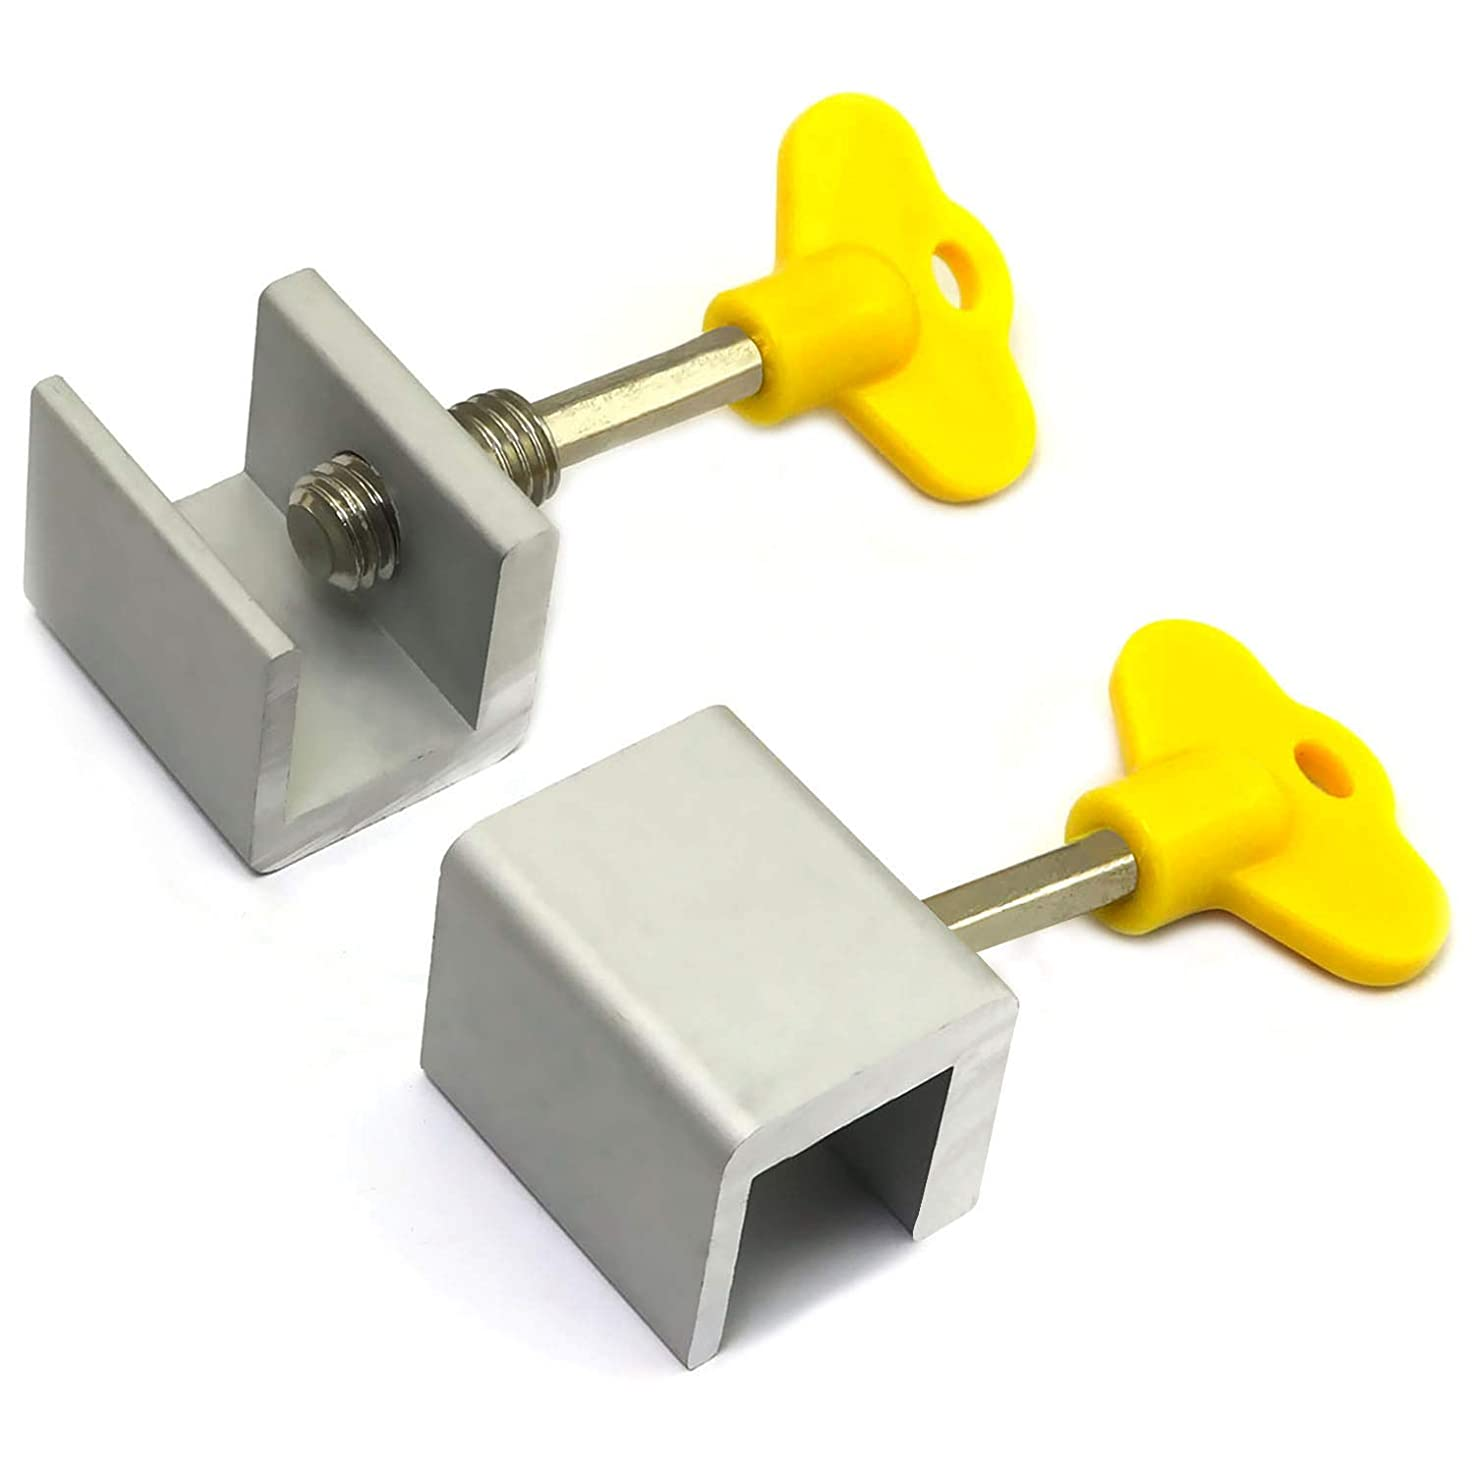 E-outstanding 2PCS Adjustable Sliding Window Locks Aluminum Alloy Door Frame Security Locks with Key